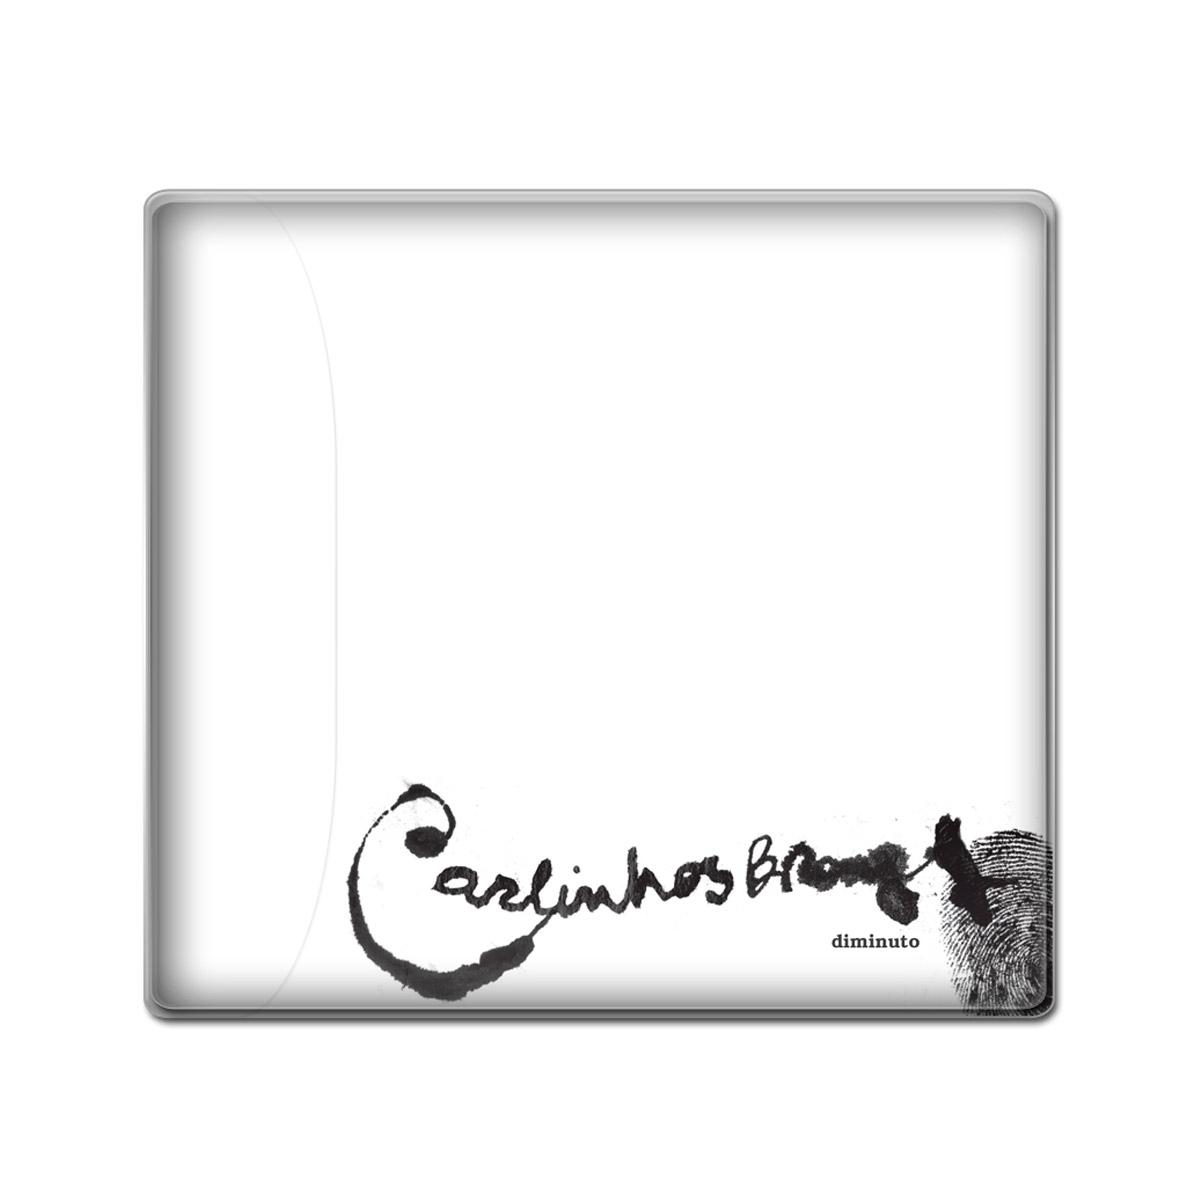 CD Carlinhos Brown Diminuto